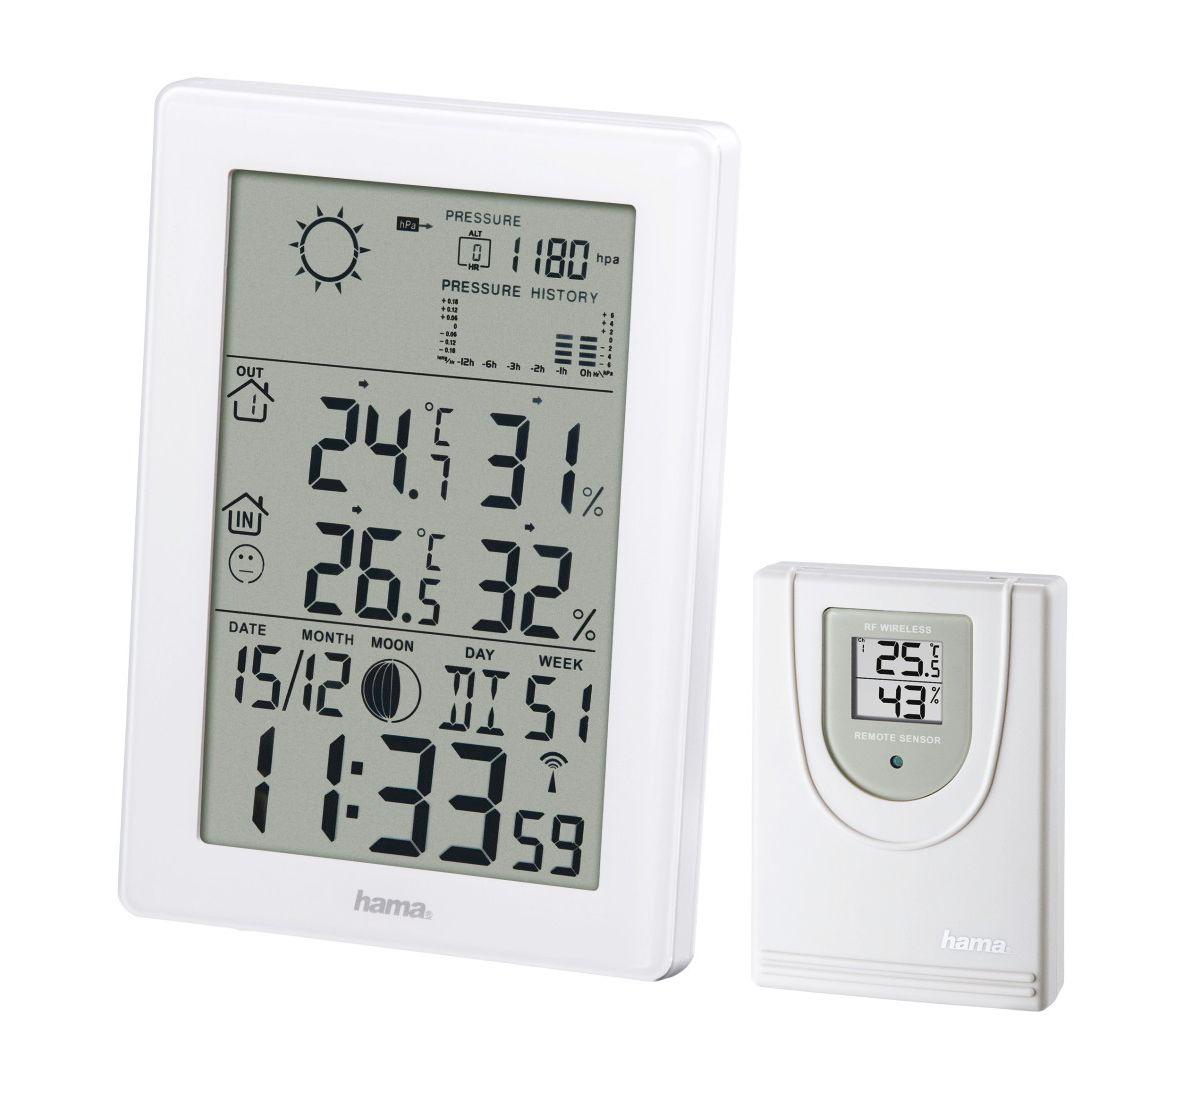 Hama Funk Wetterstation Barometer Hygrometer Vo...